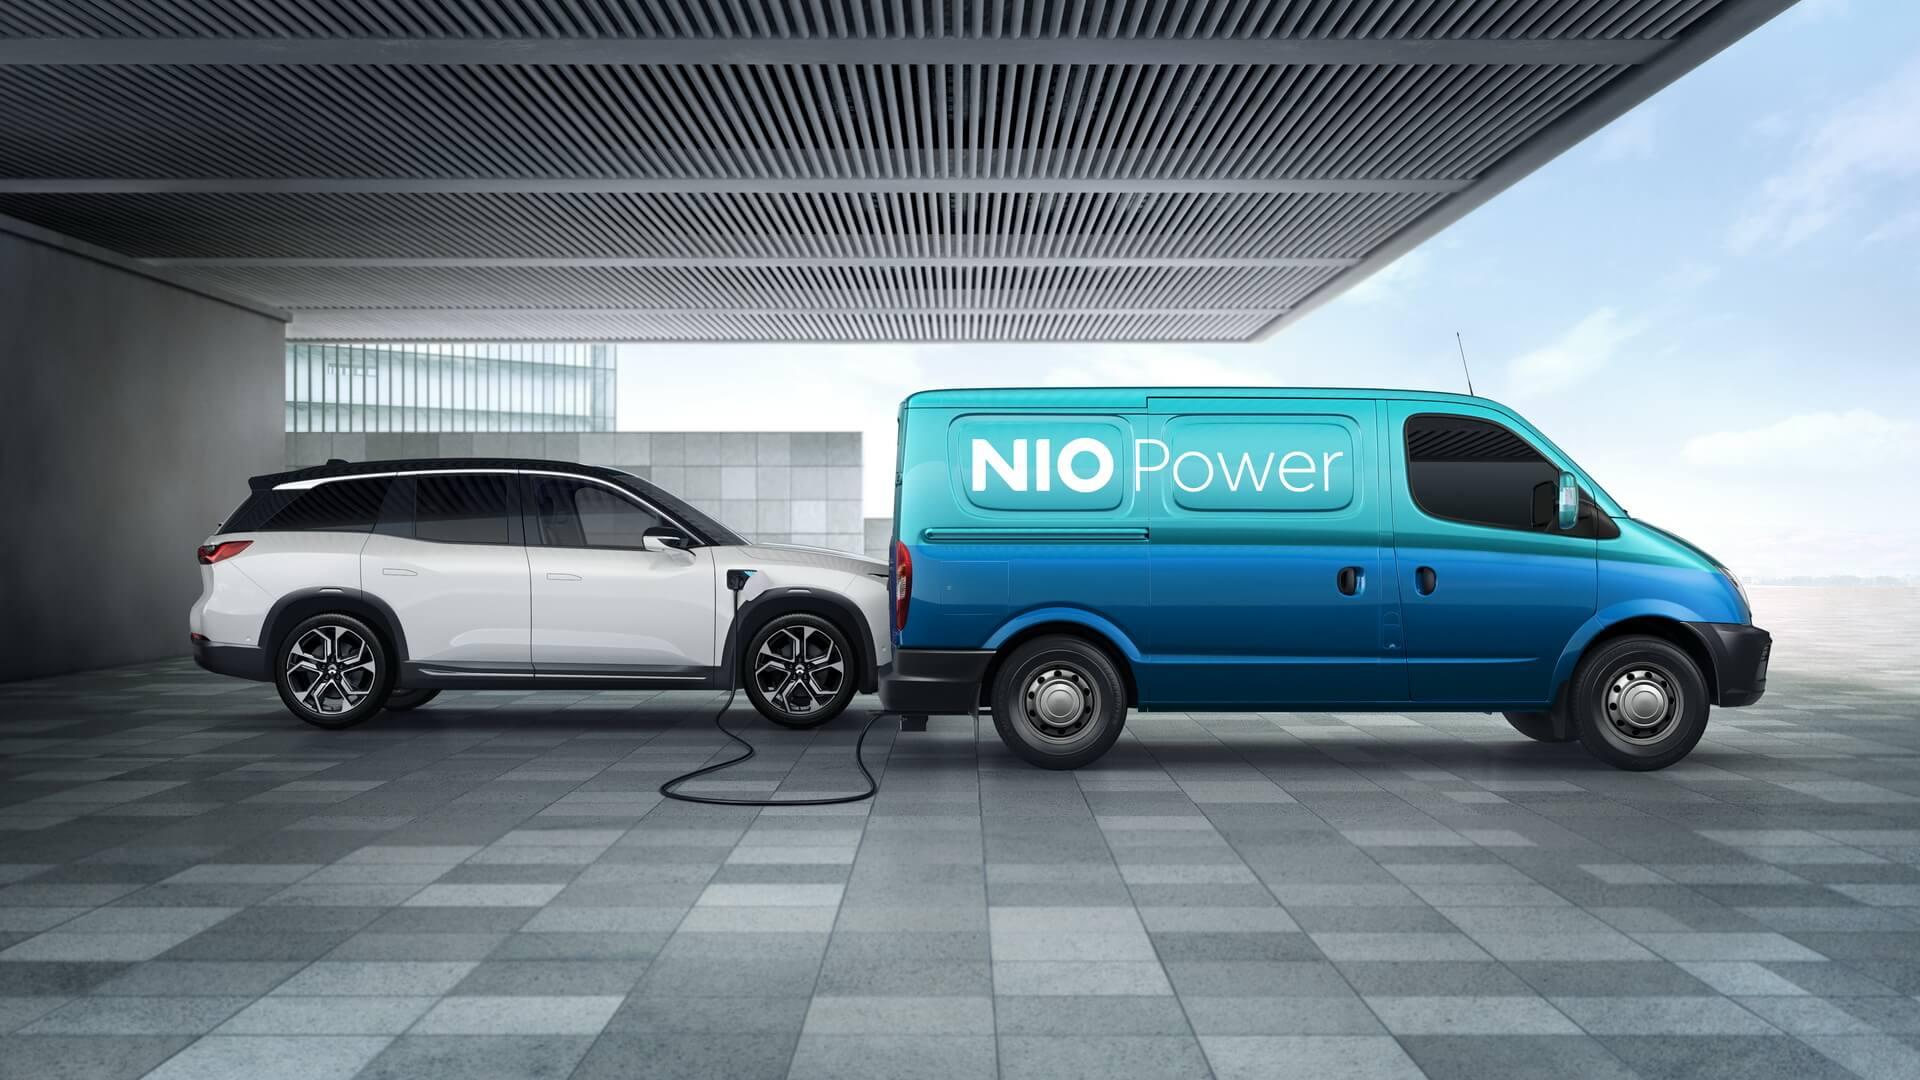 Мобильные фургоны NIO Power